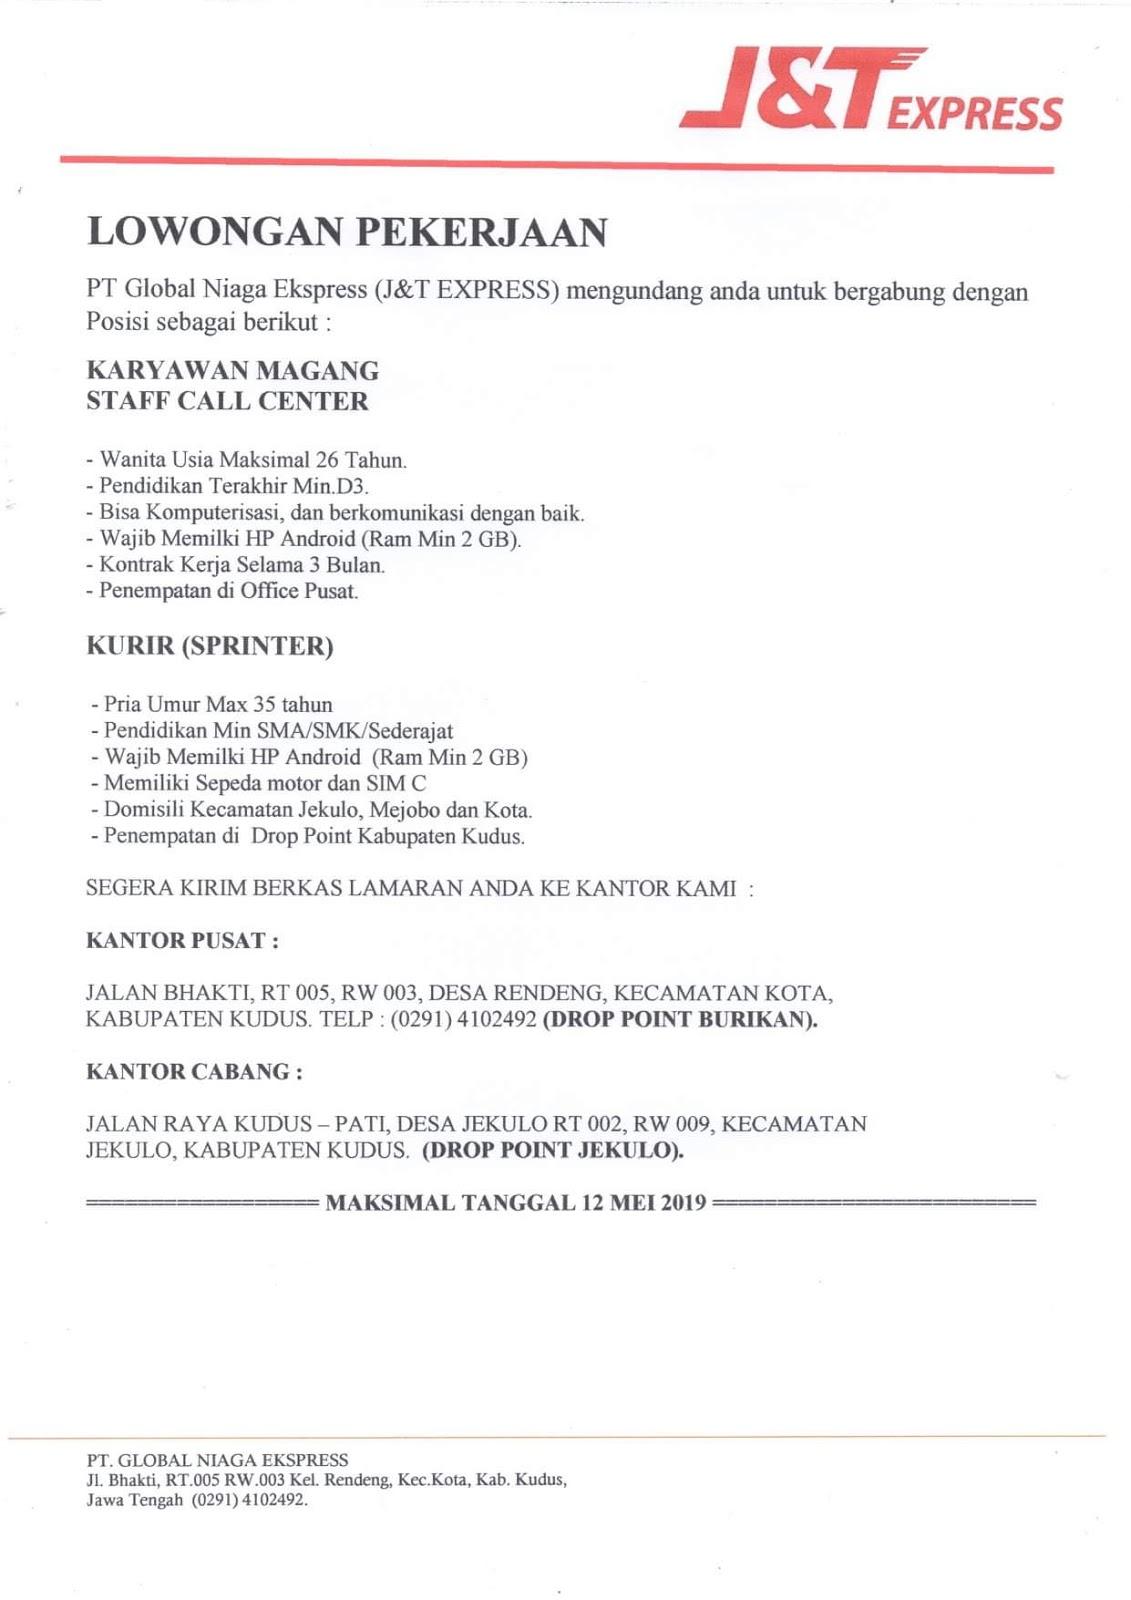 Informasi Lowongan Kerja Sebagai Karyawan Magang Staff Call Center, Kurir di J&T Express Kudus